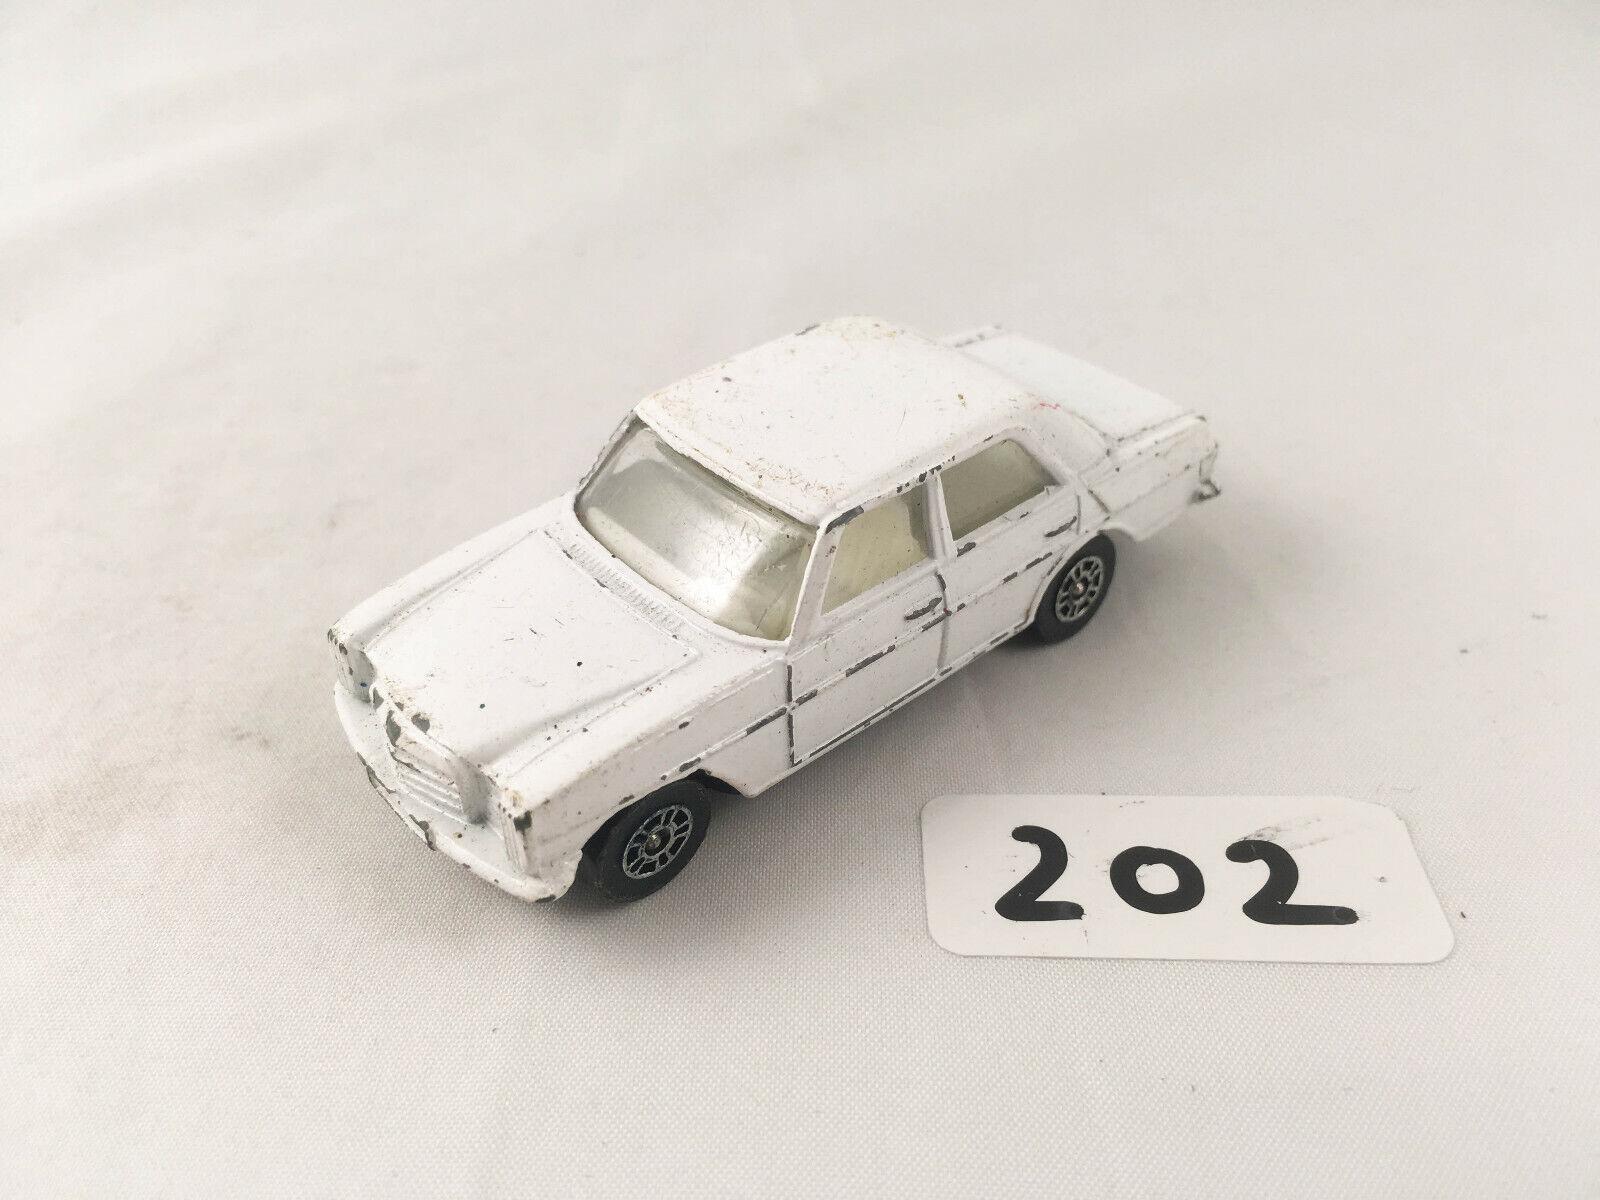 VERY RARE WHITE CORGI JUNIORS MERCEDES-BENZ 240D 240D DIECAST TOY CAR 1970S